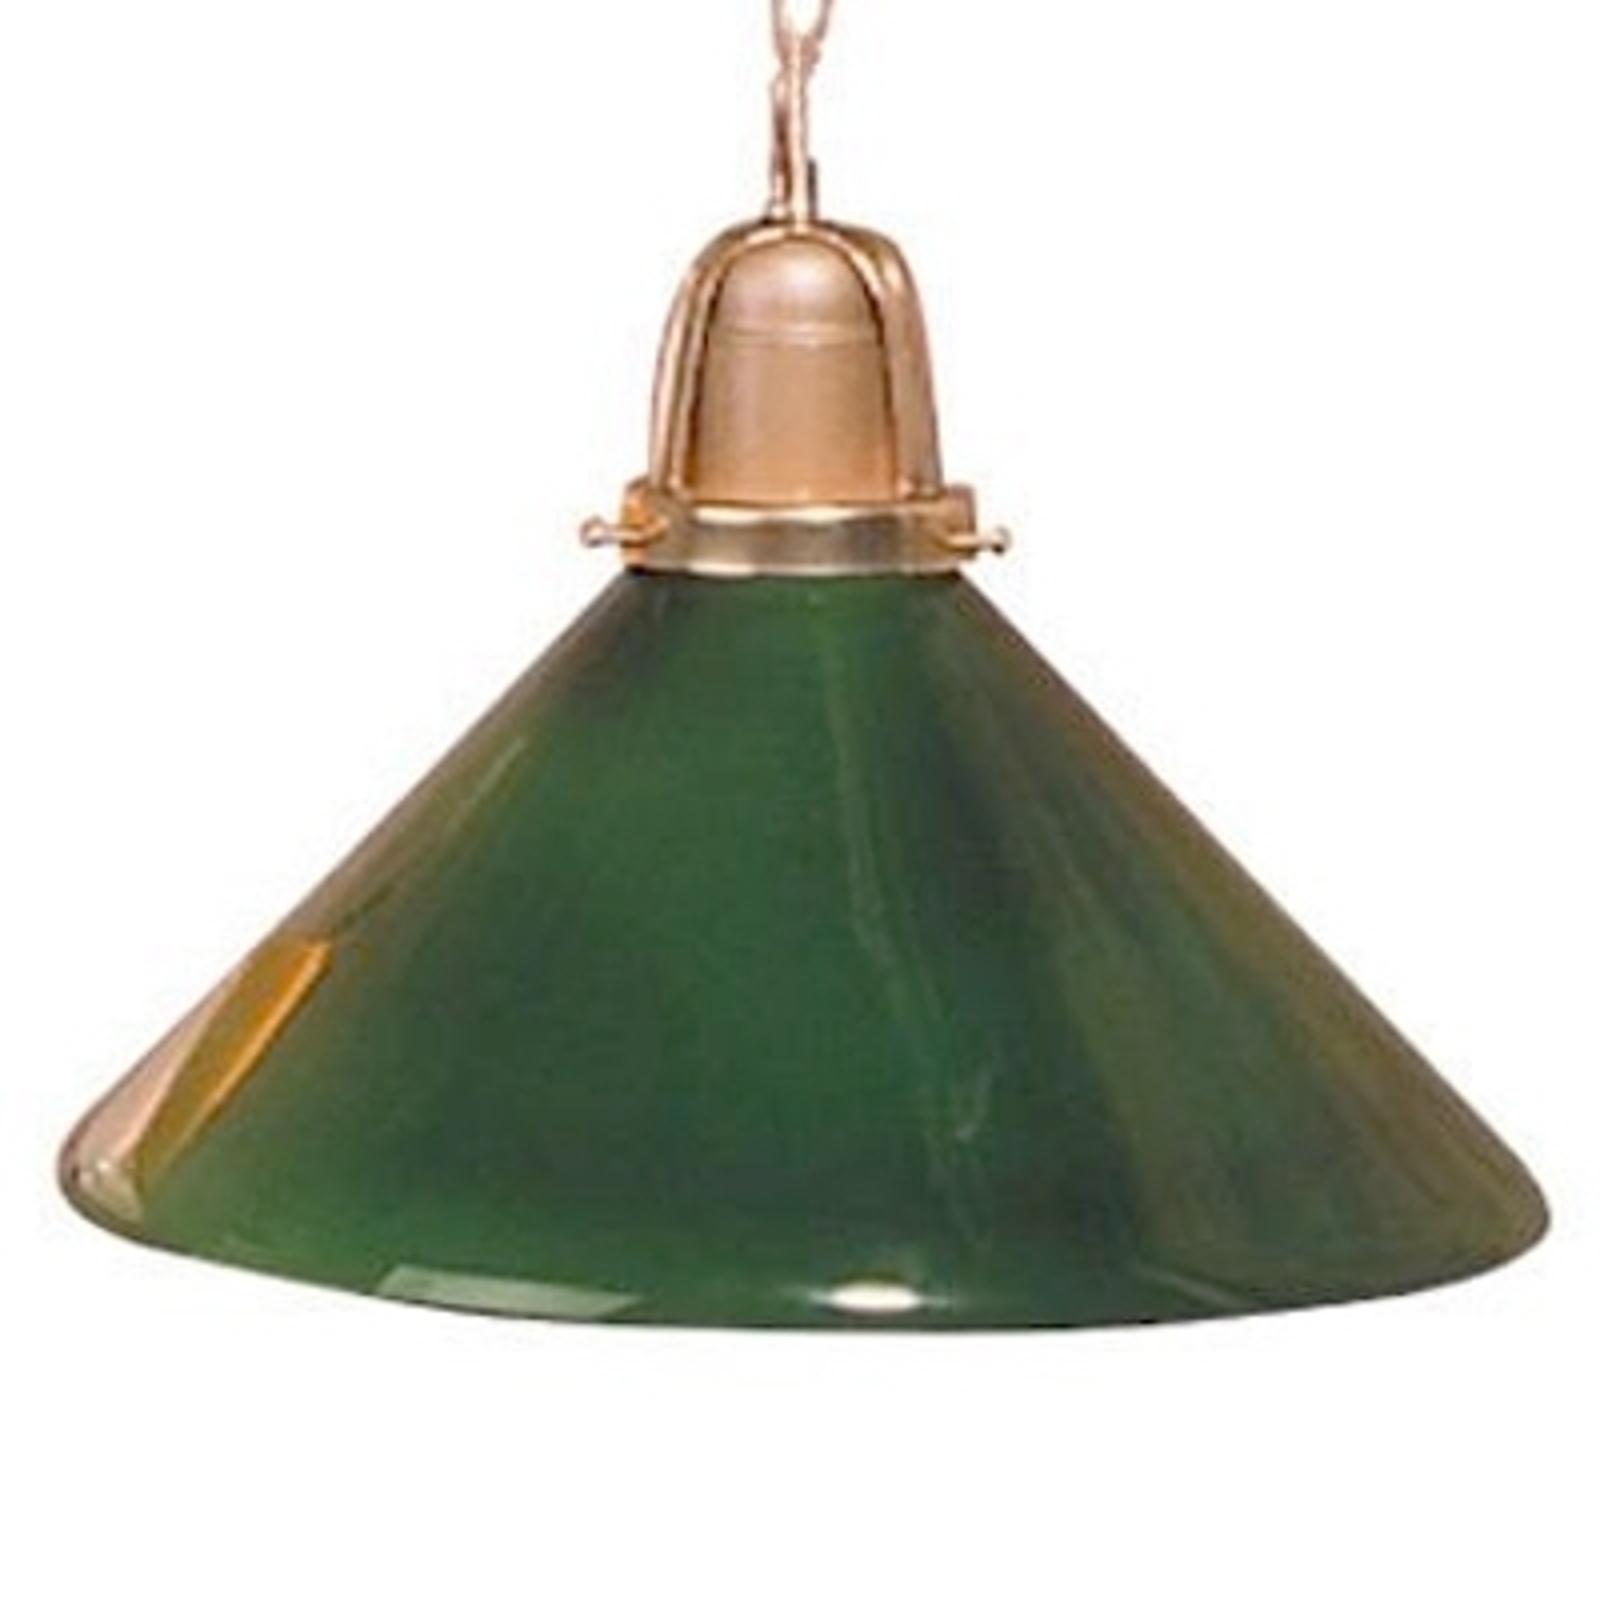 Fargerik SARINA hengelampe i grønt